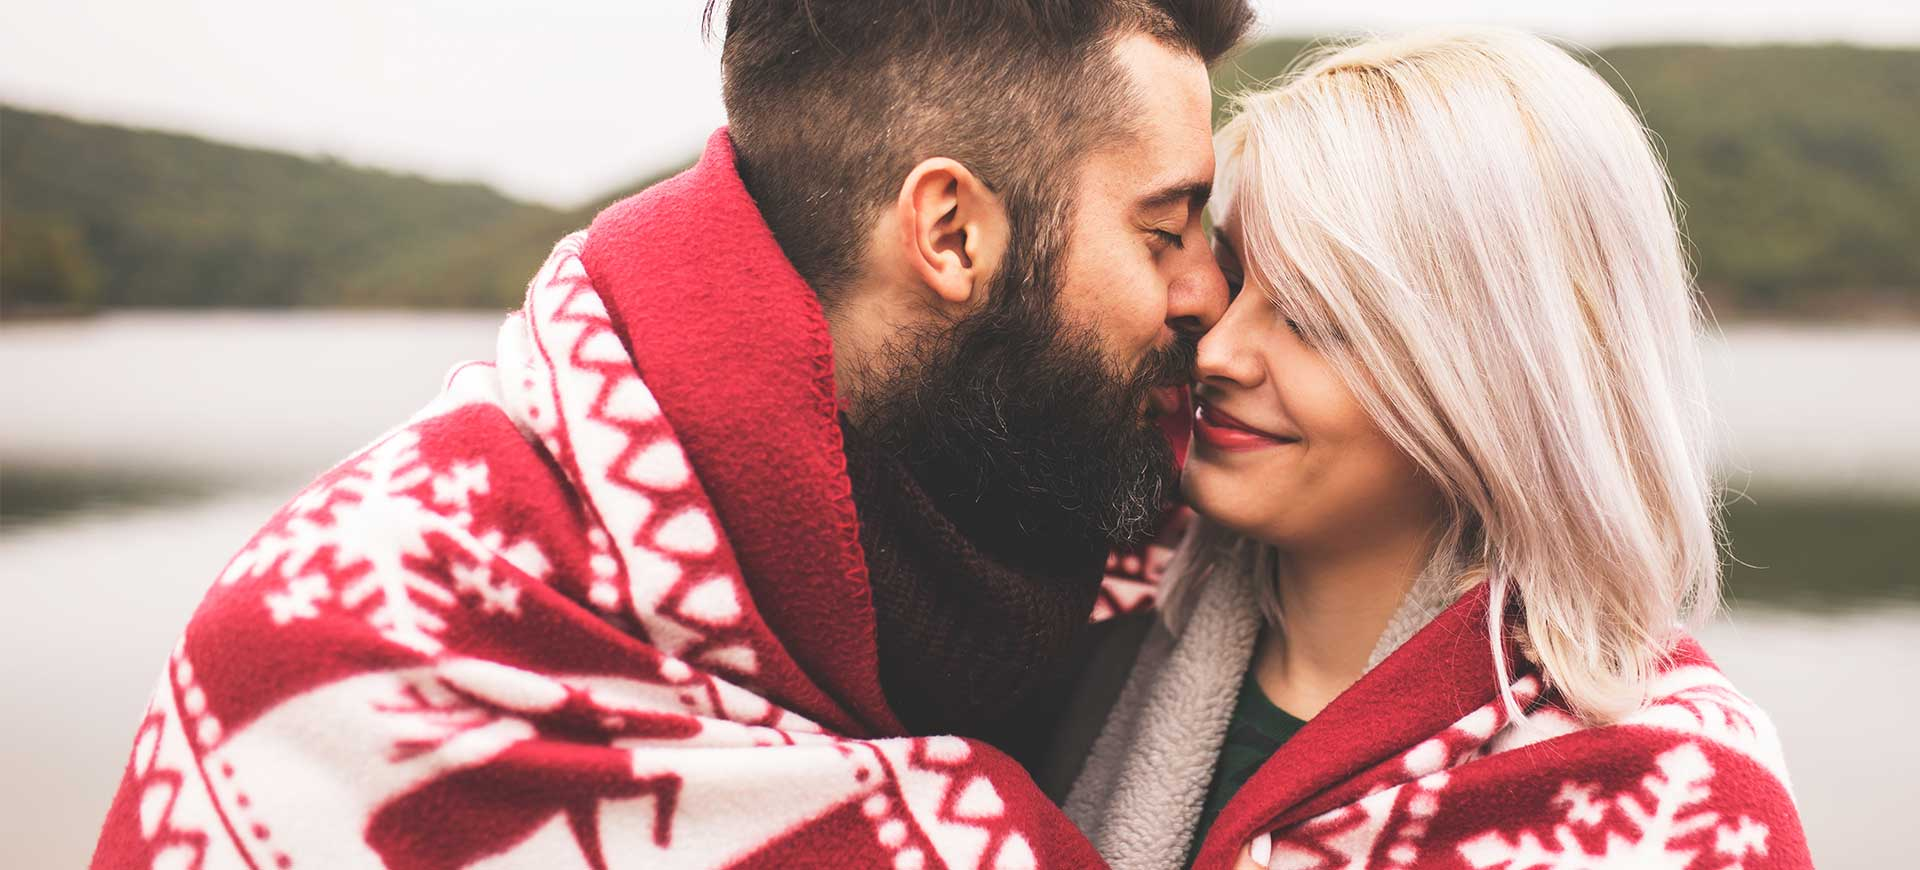 hastighet dating Geelong